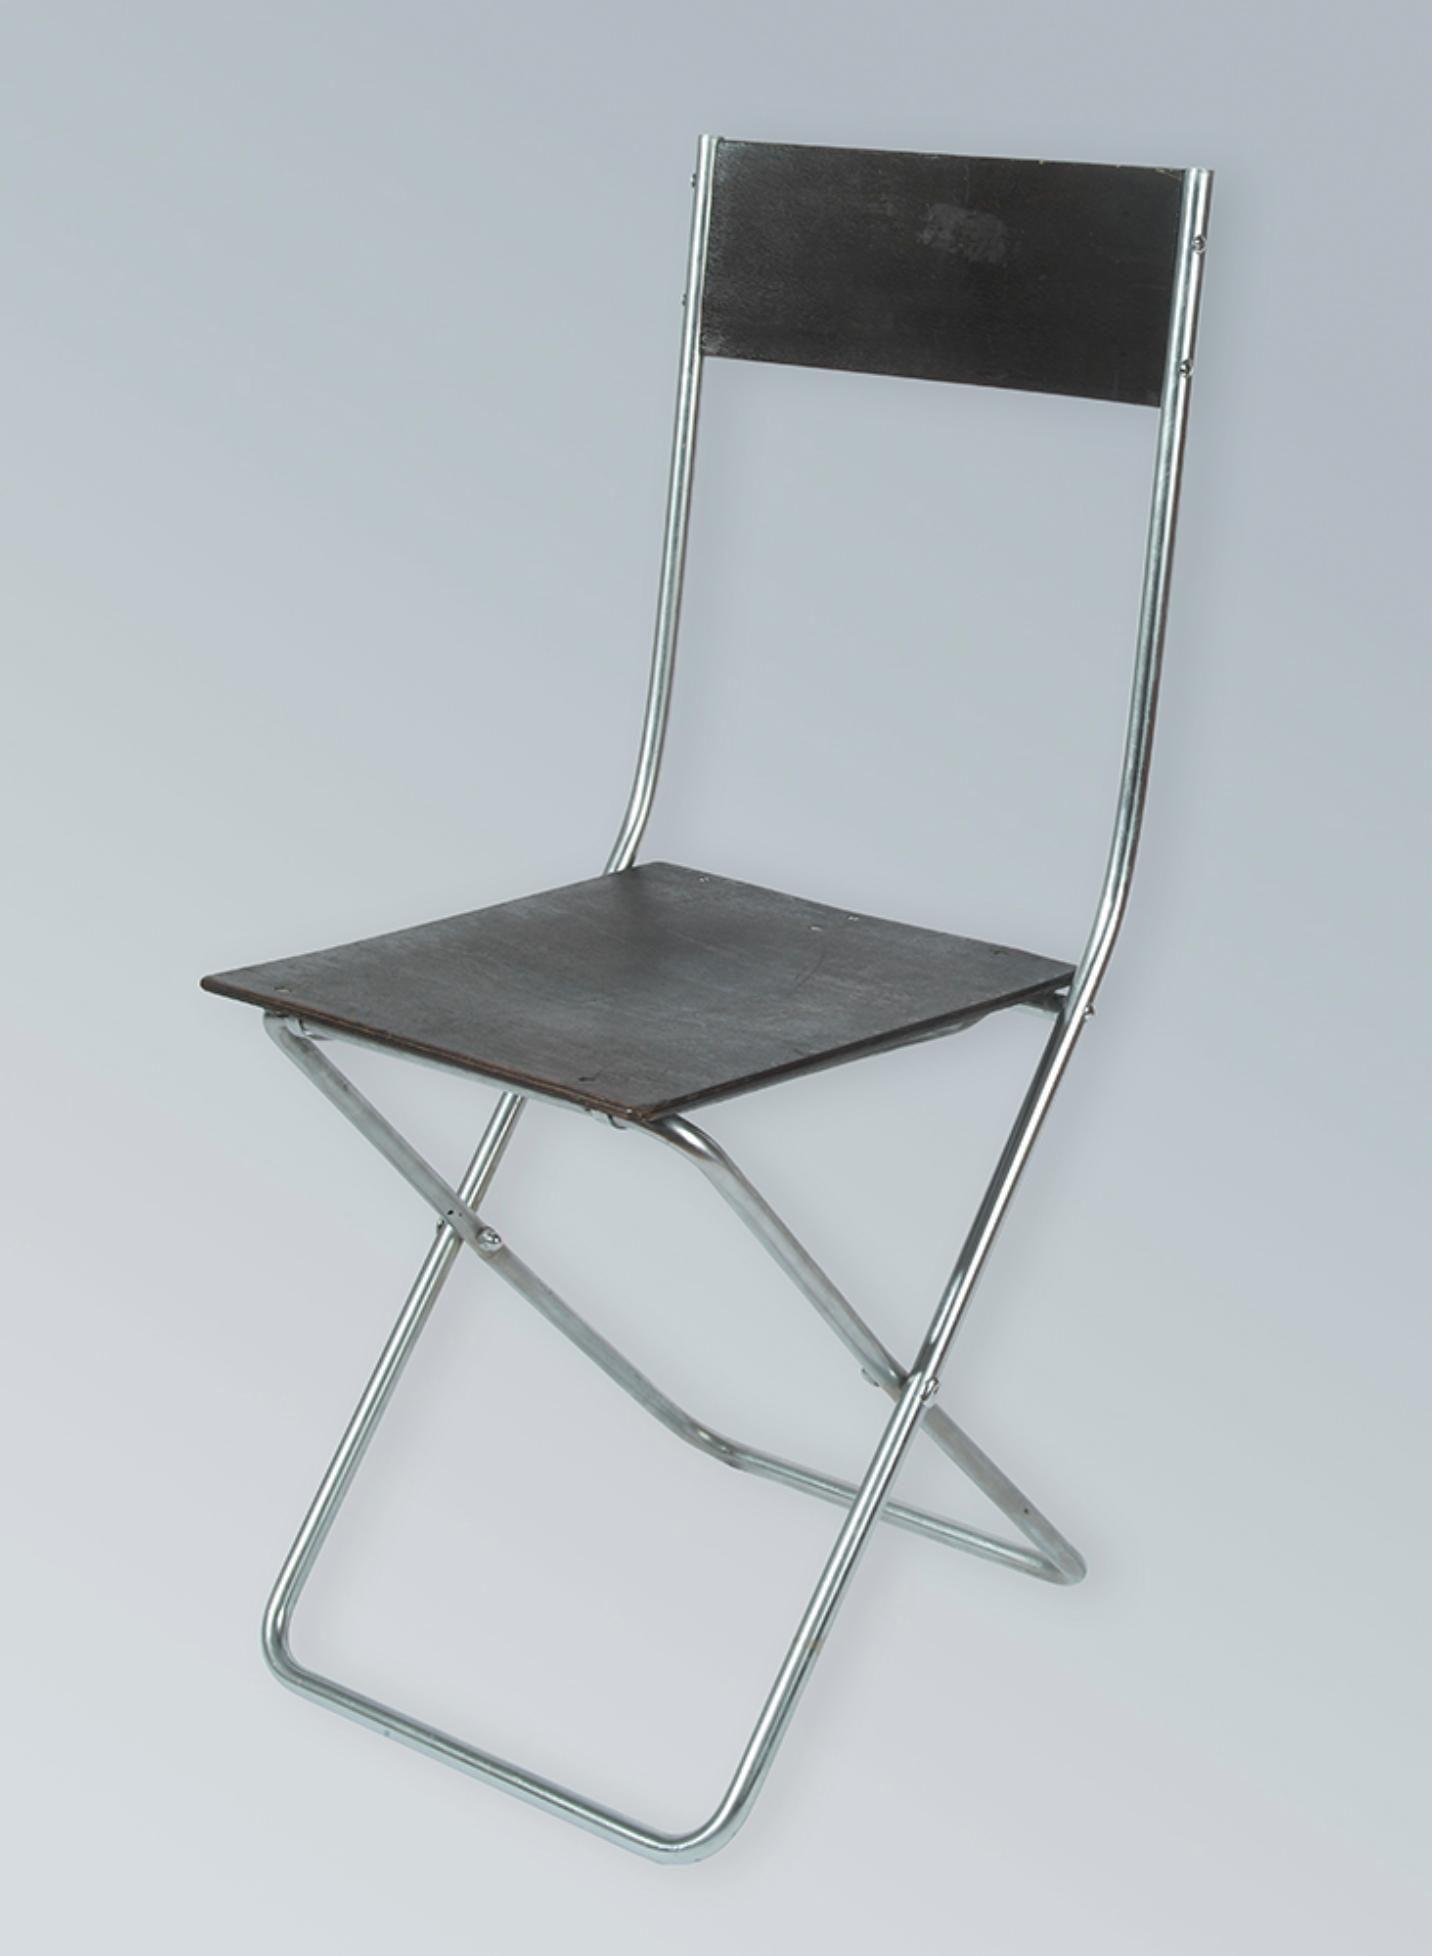 Folding Chair Design Alfred Arndt 1928 Production  # Muebles Bauhaus Caracteristicas